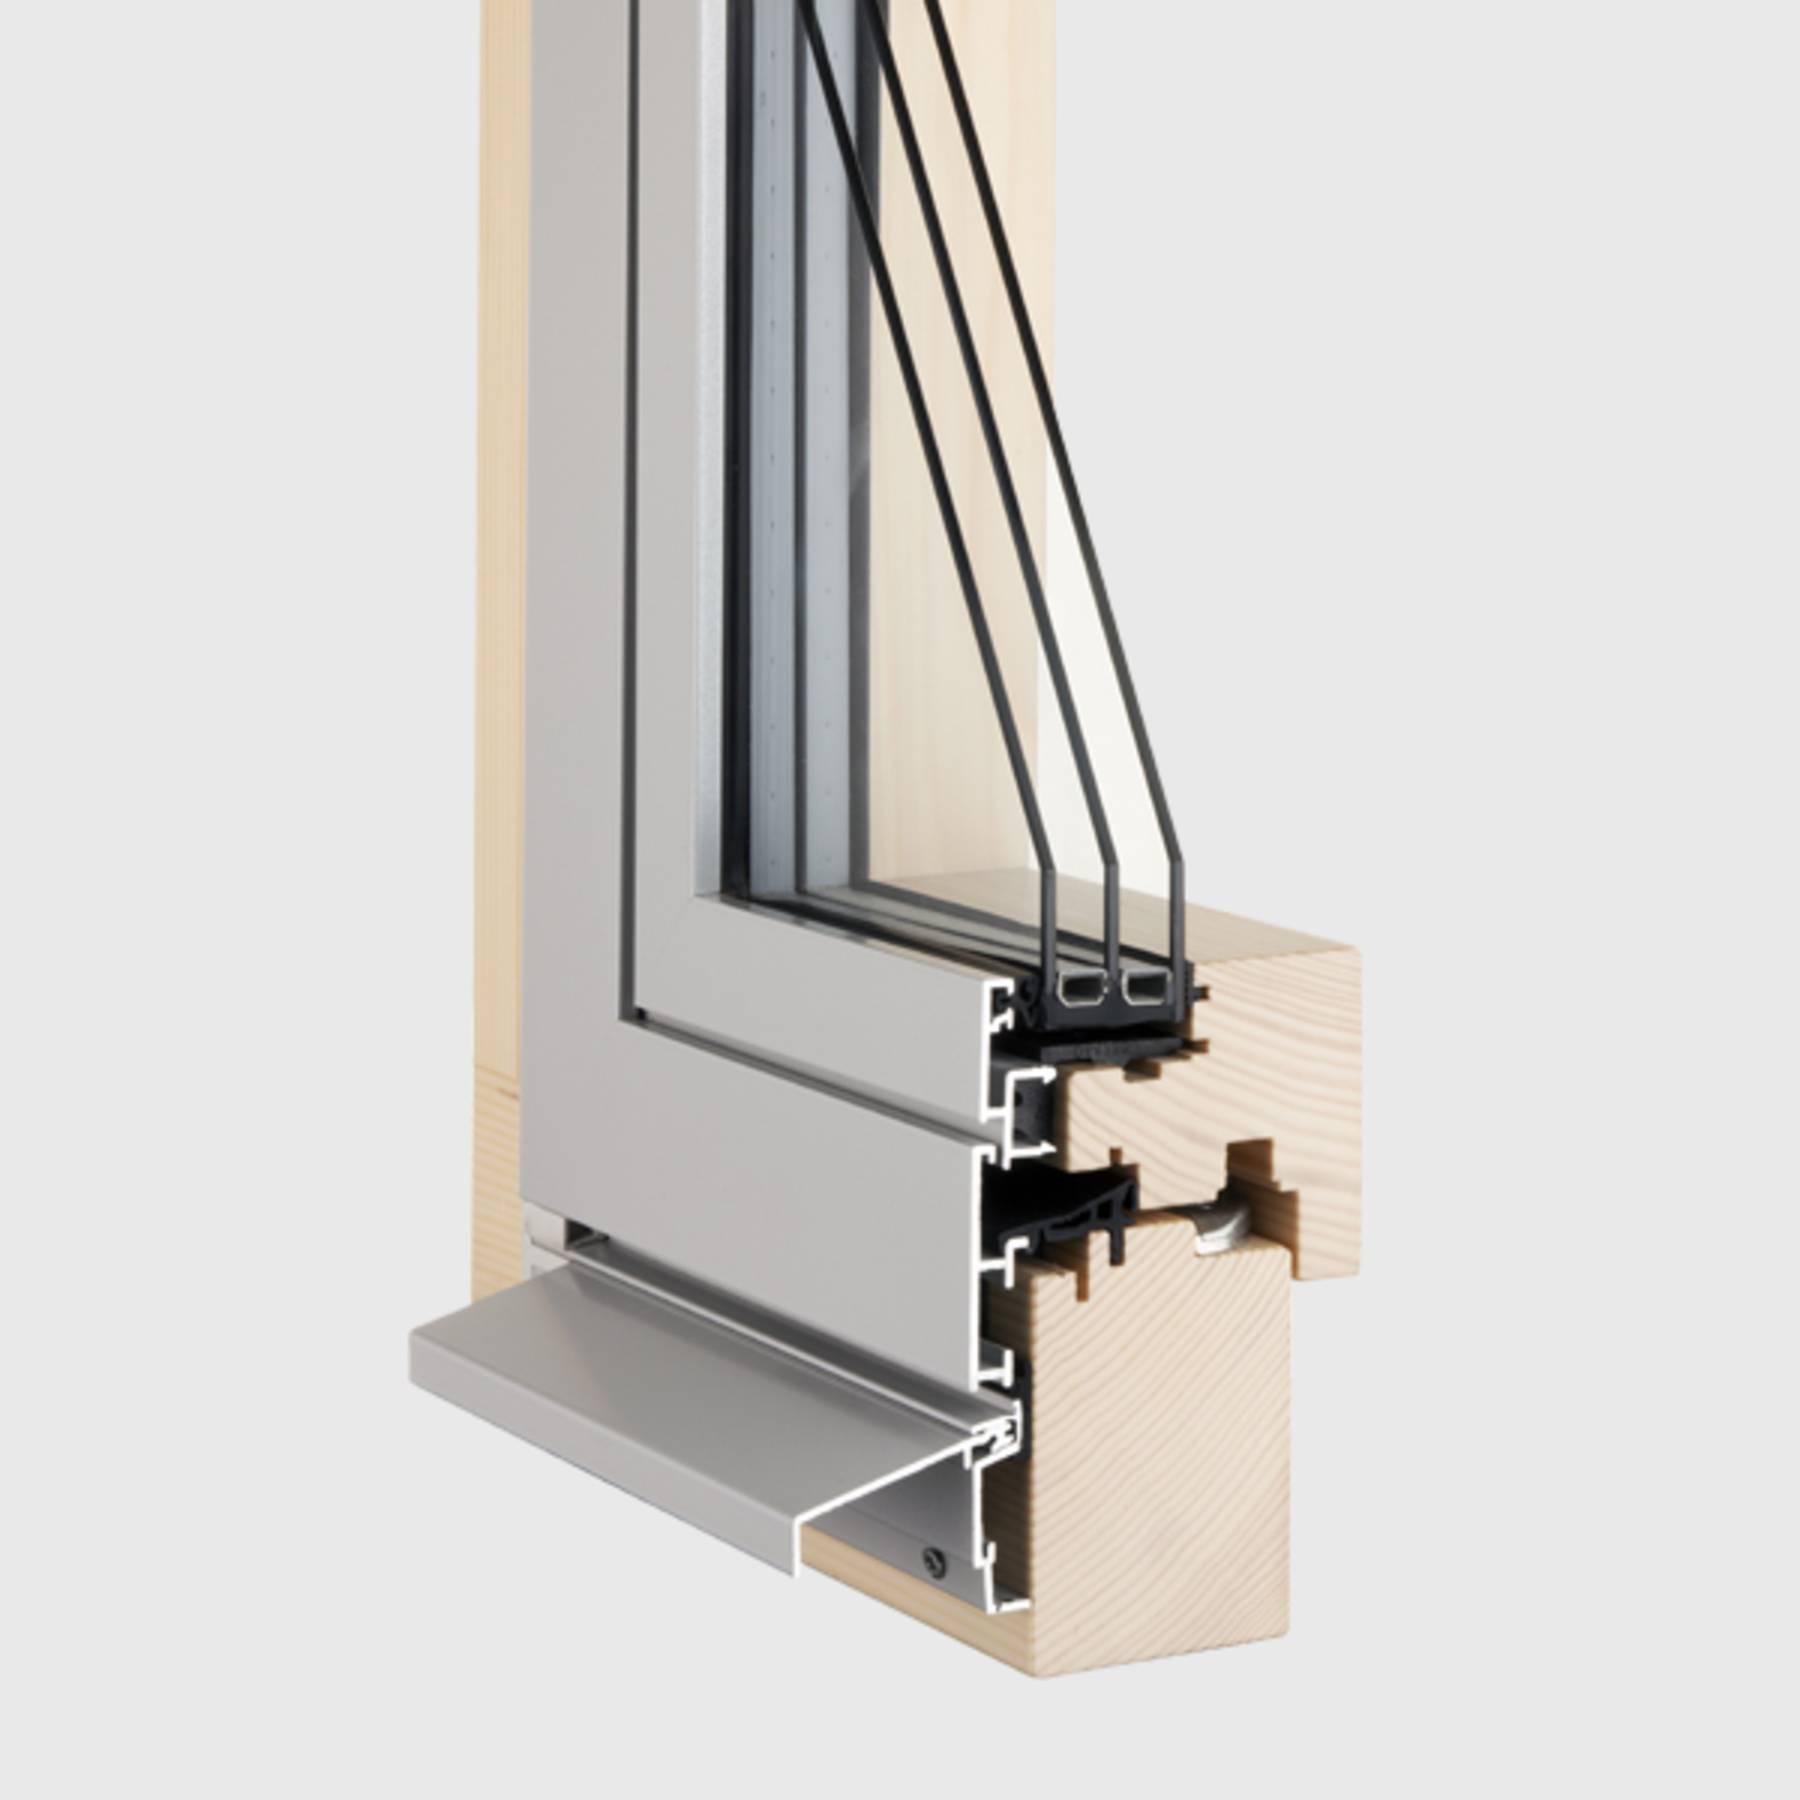 Hinze holzfenster holzmetallfenster for Fenster 0 5 ug